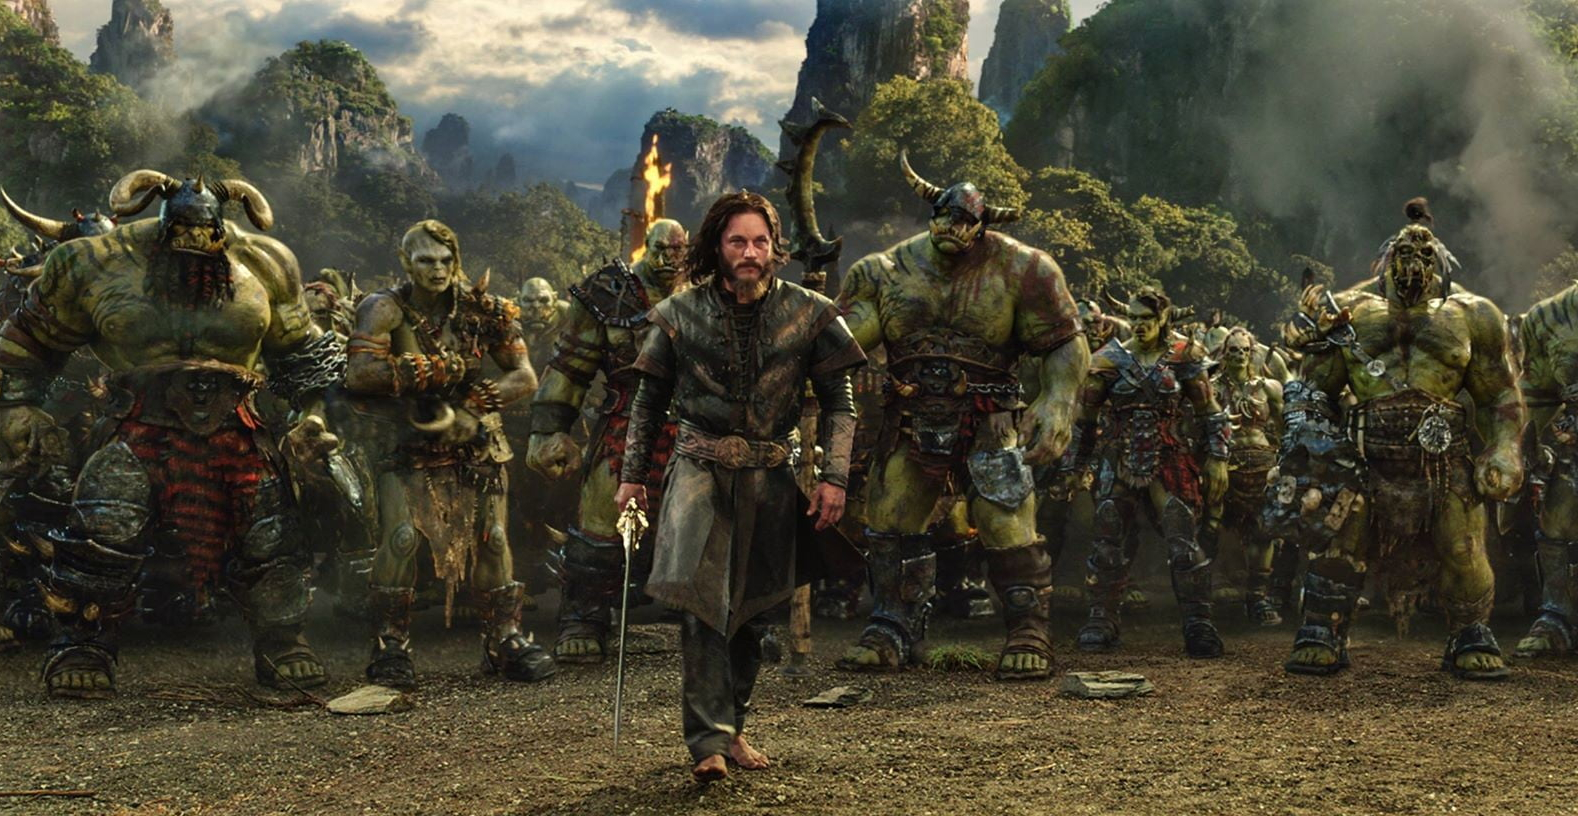 Warcraft World of Warcraft Blizzard Entertainment Orcs Humans